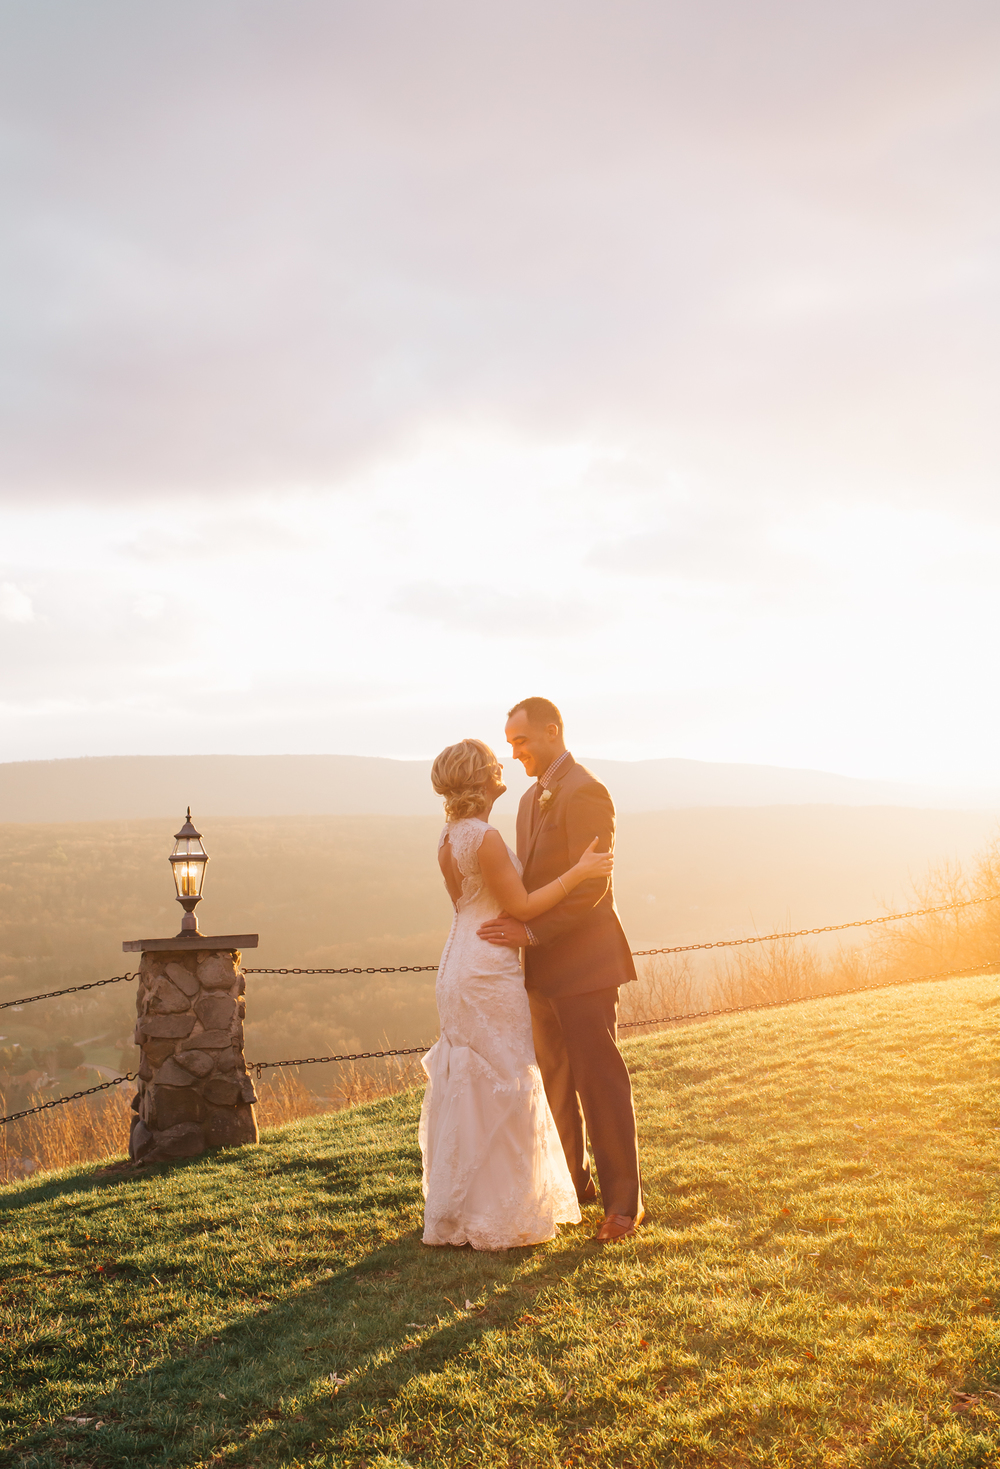 Ashley-reed-photography-pittsburgh-wedding-photographer-ashley-reed-pocconos-pa-mountain-top-wedding-97.jpg